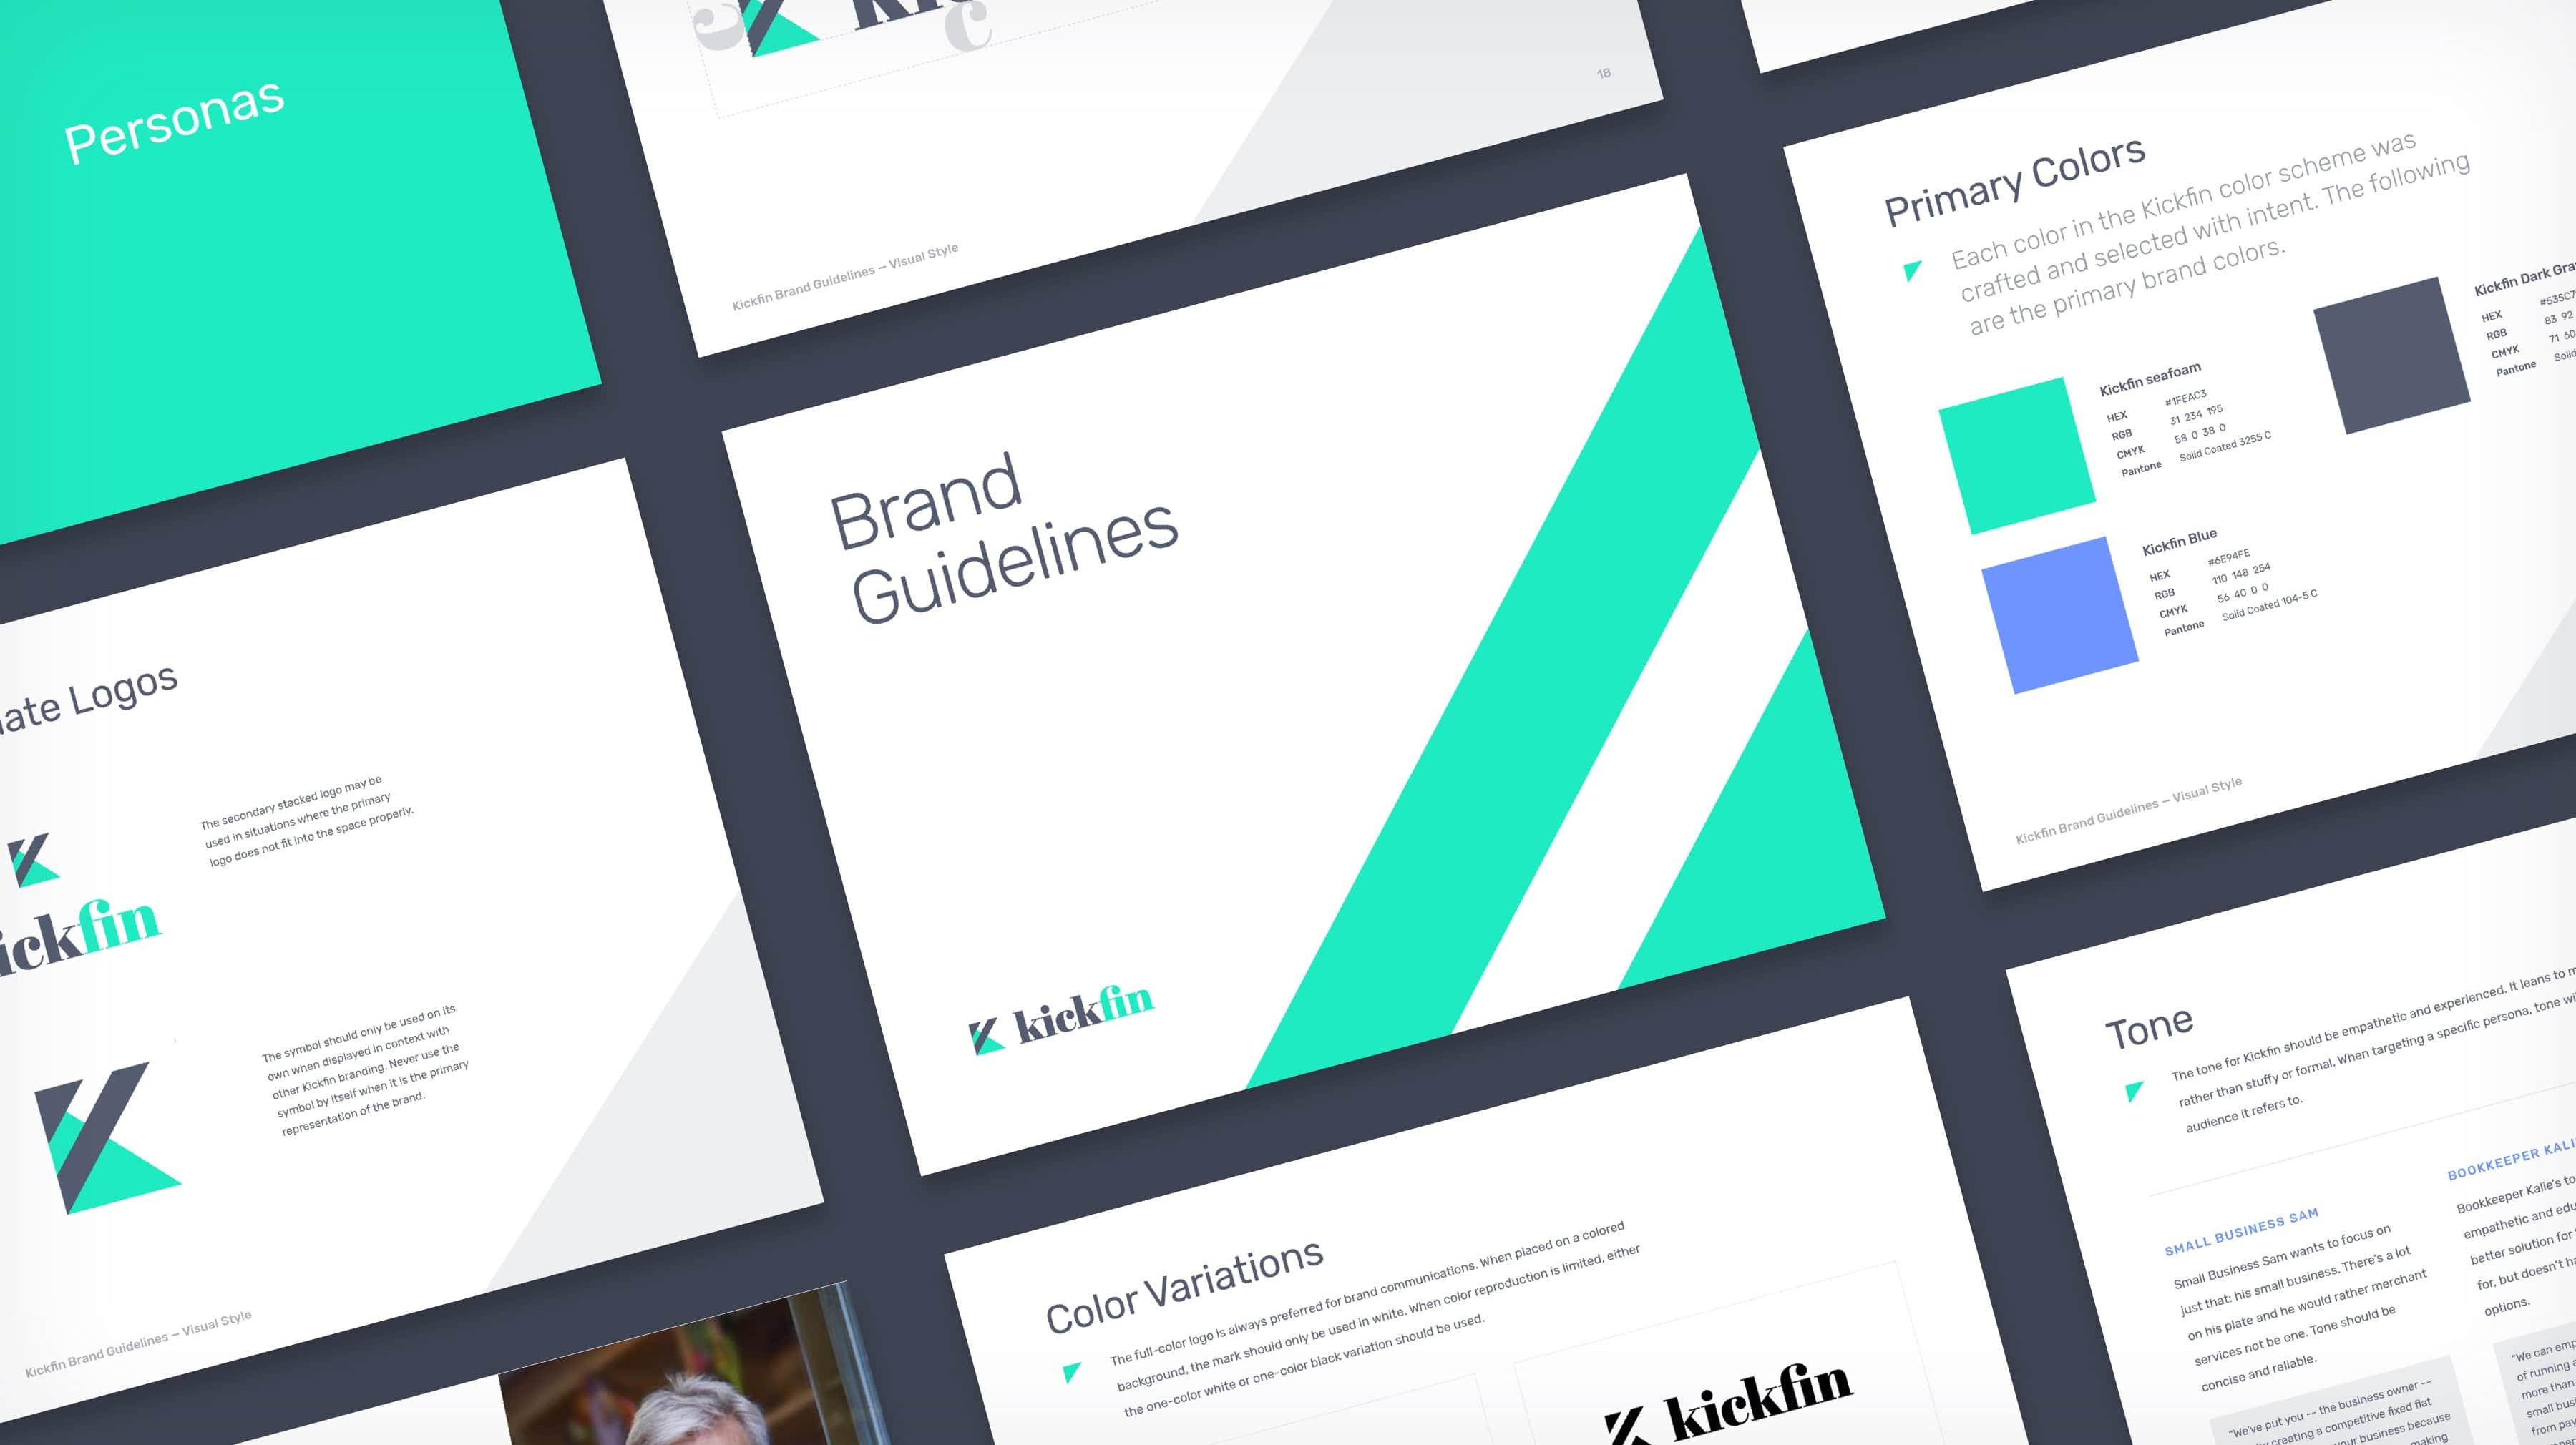 kickfin-brand-guidelines